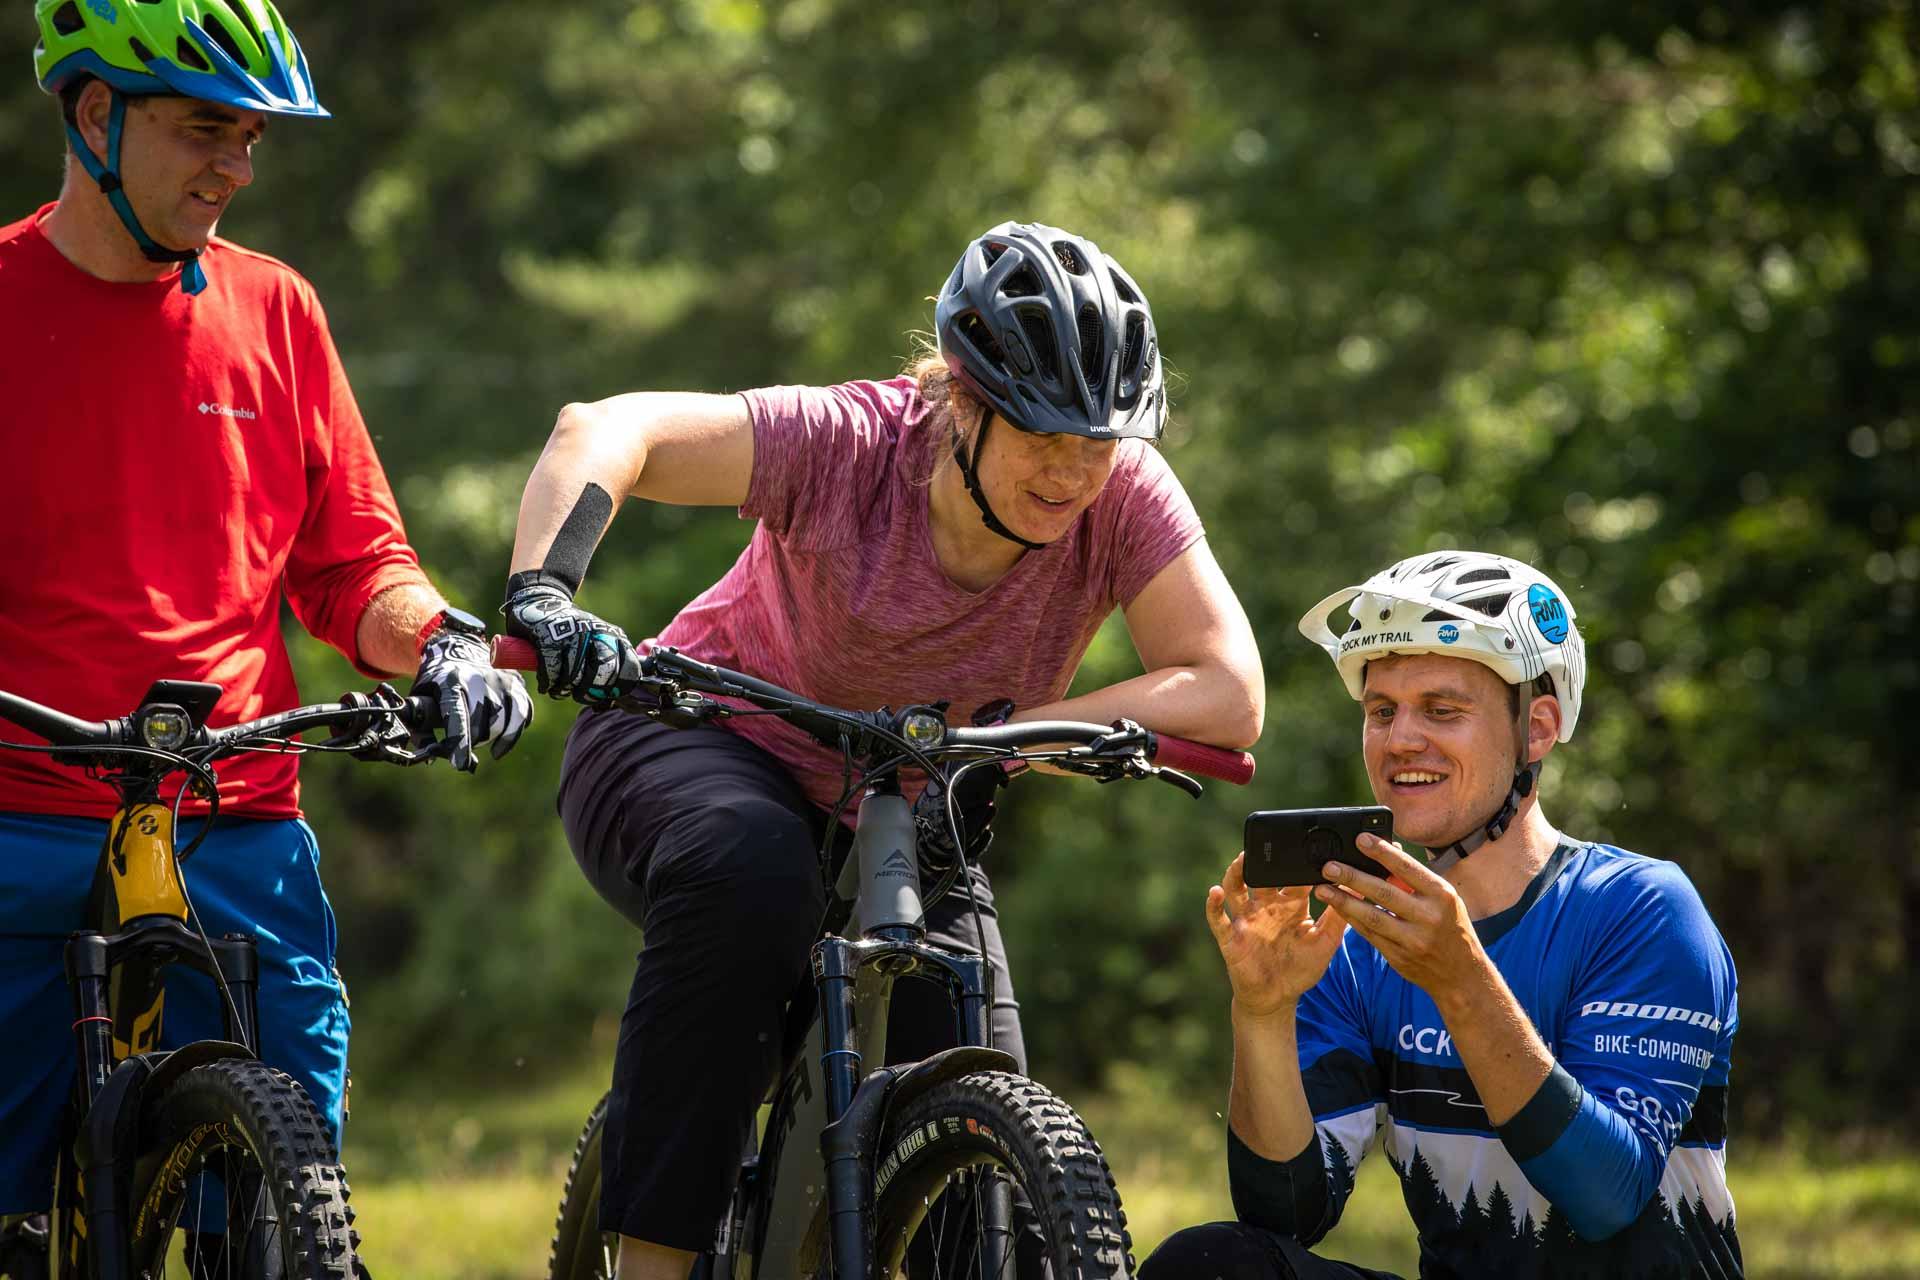 eMTB eBike Fortgeschritten Fahrtechnik Kurs in Siegen - Rock my Trail Bikeschule321